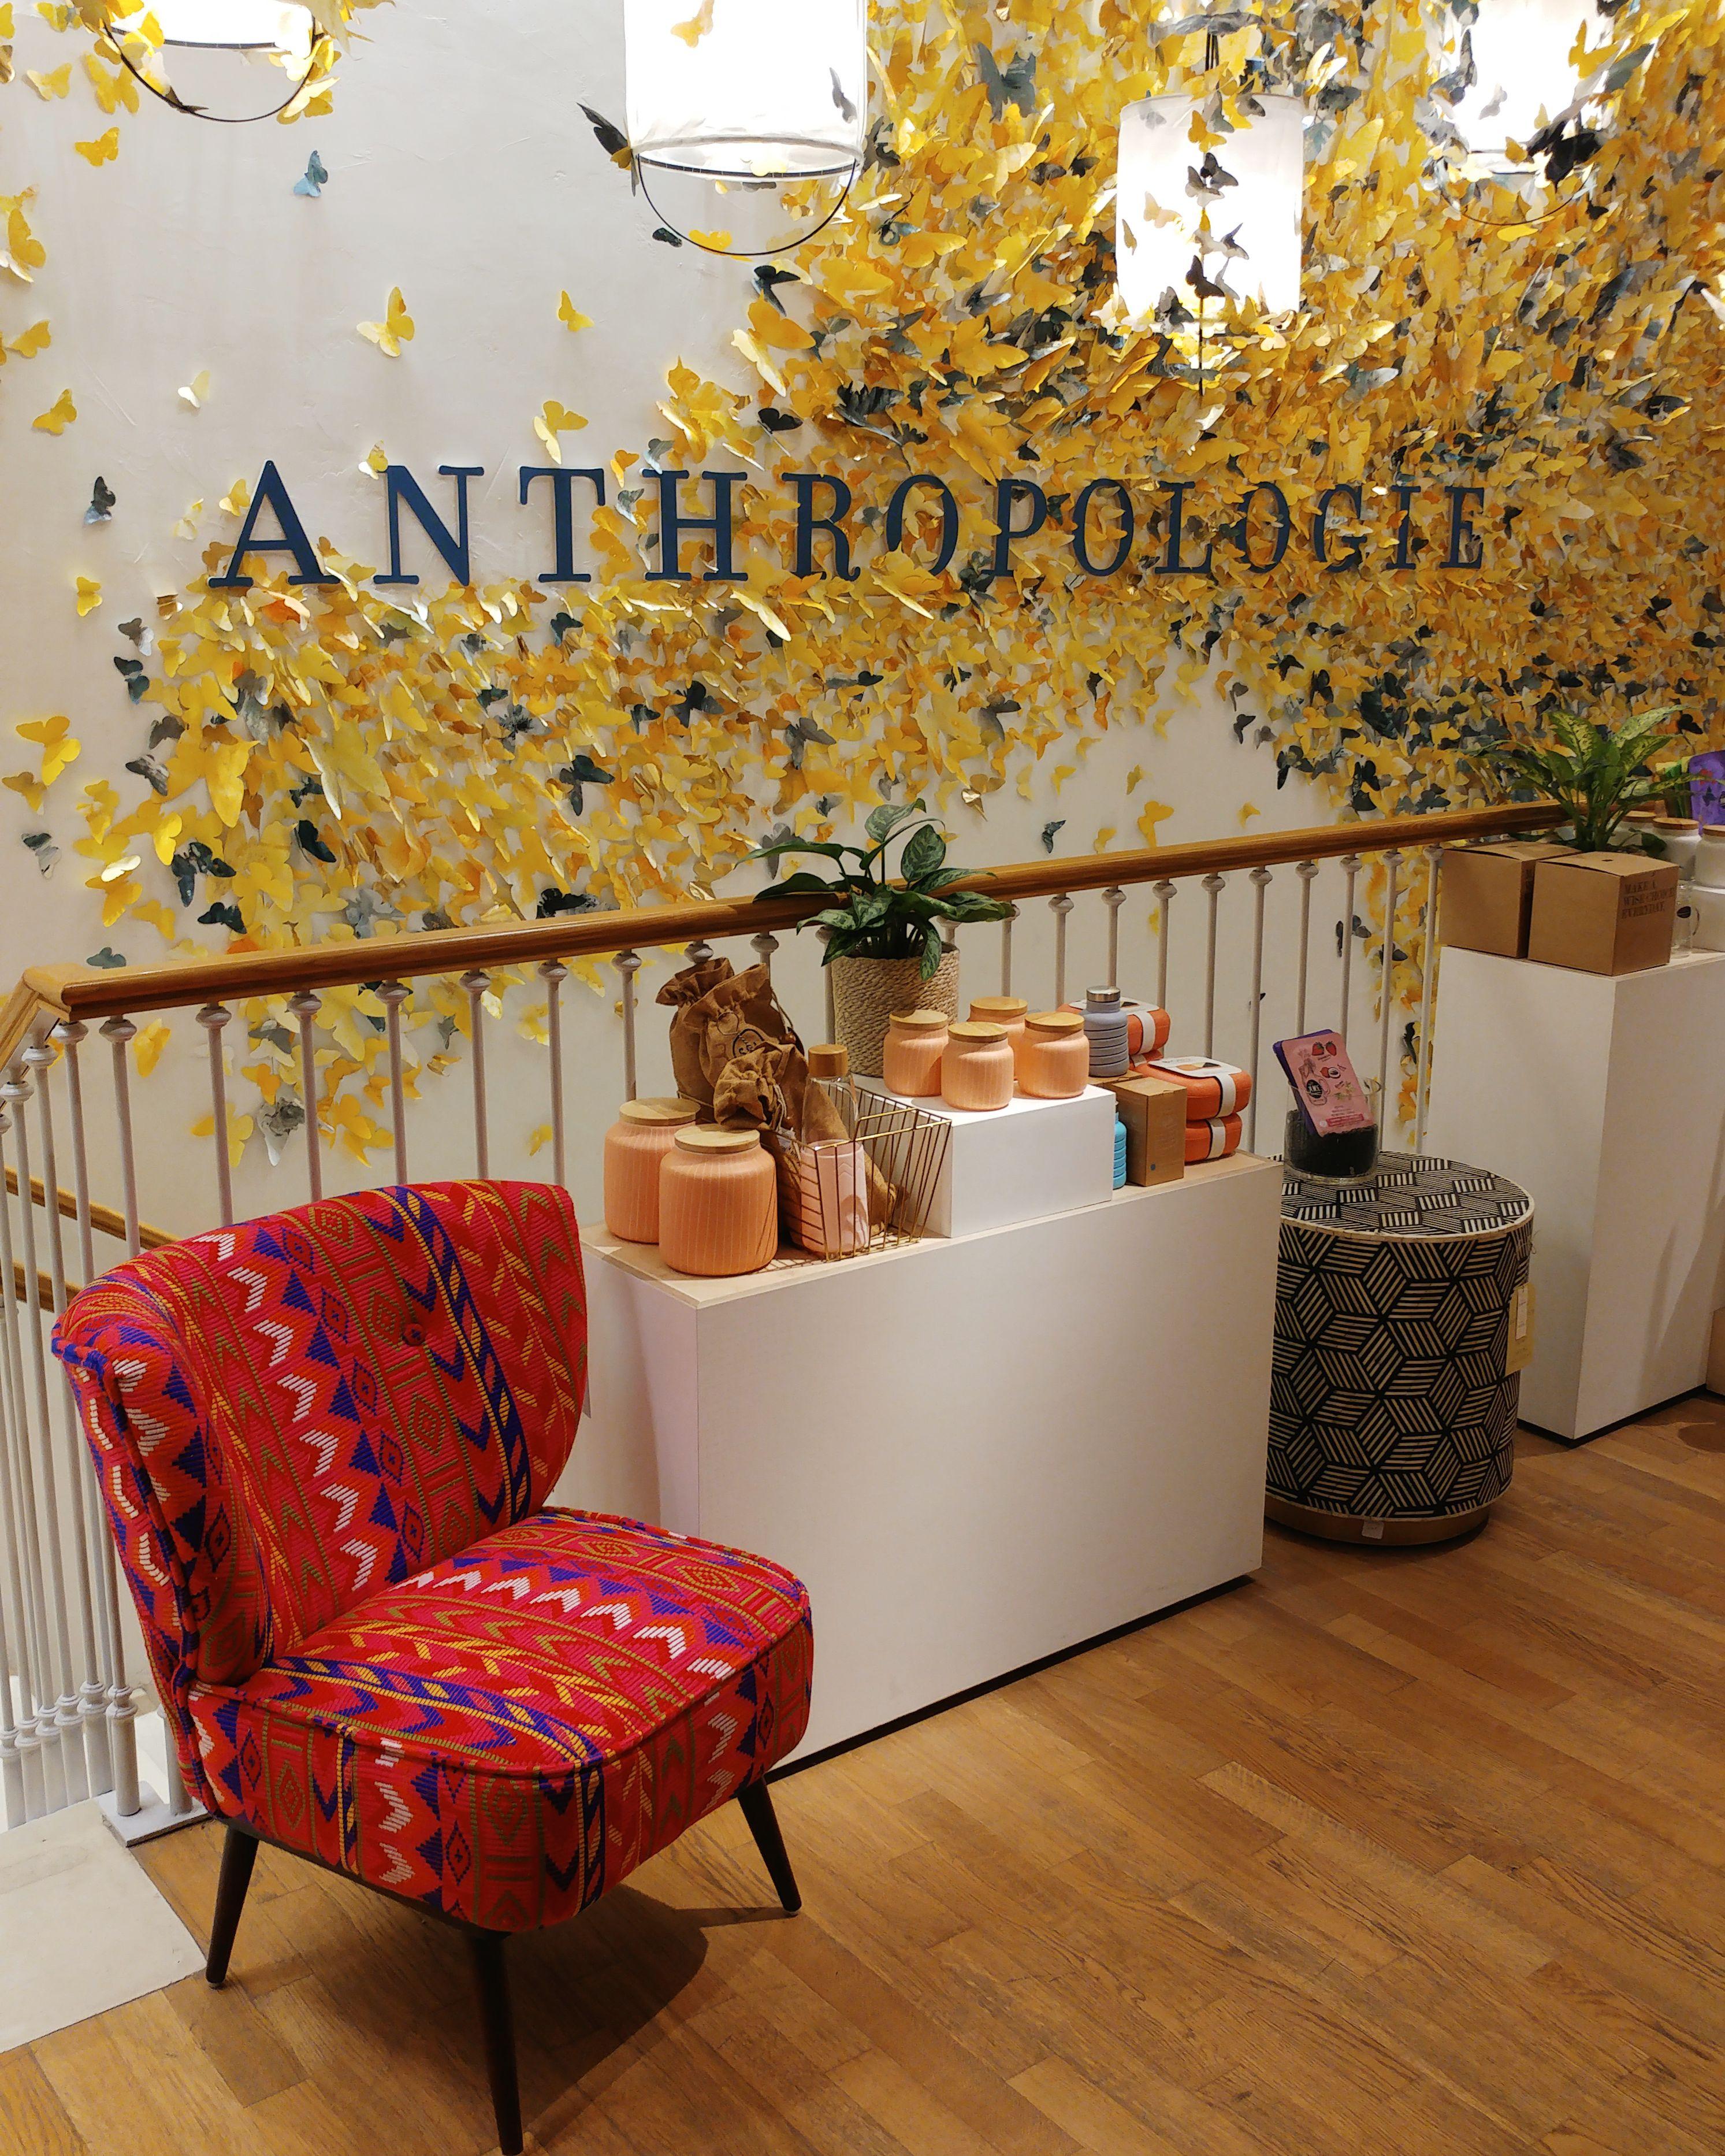 Anthropologie shop in Barcelona